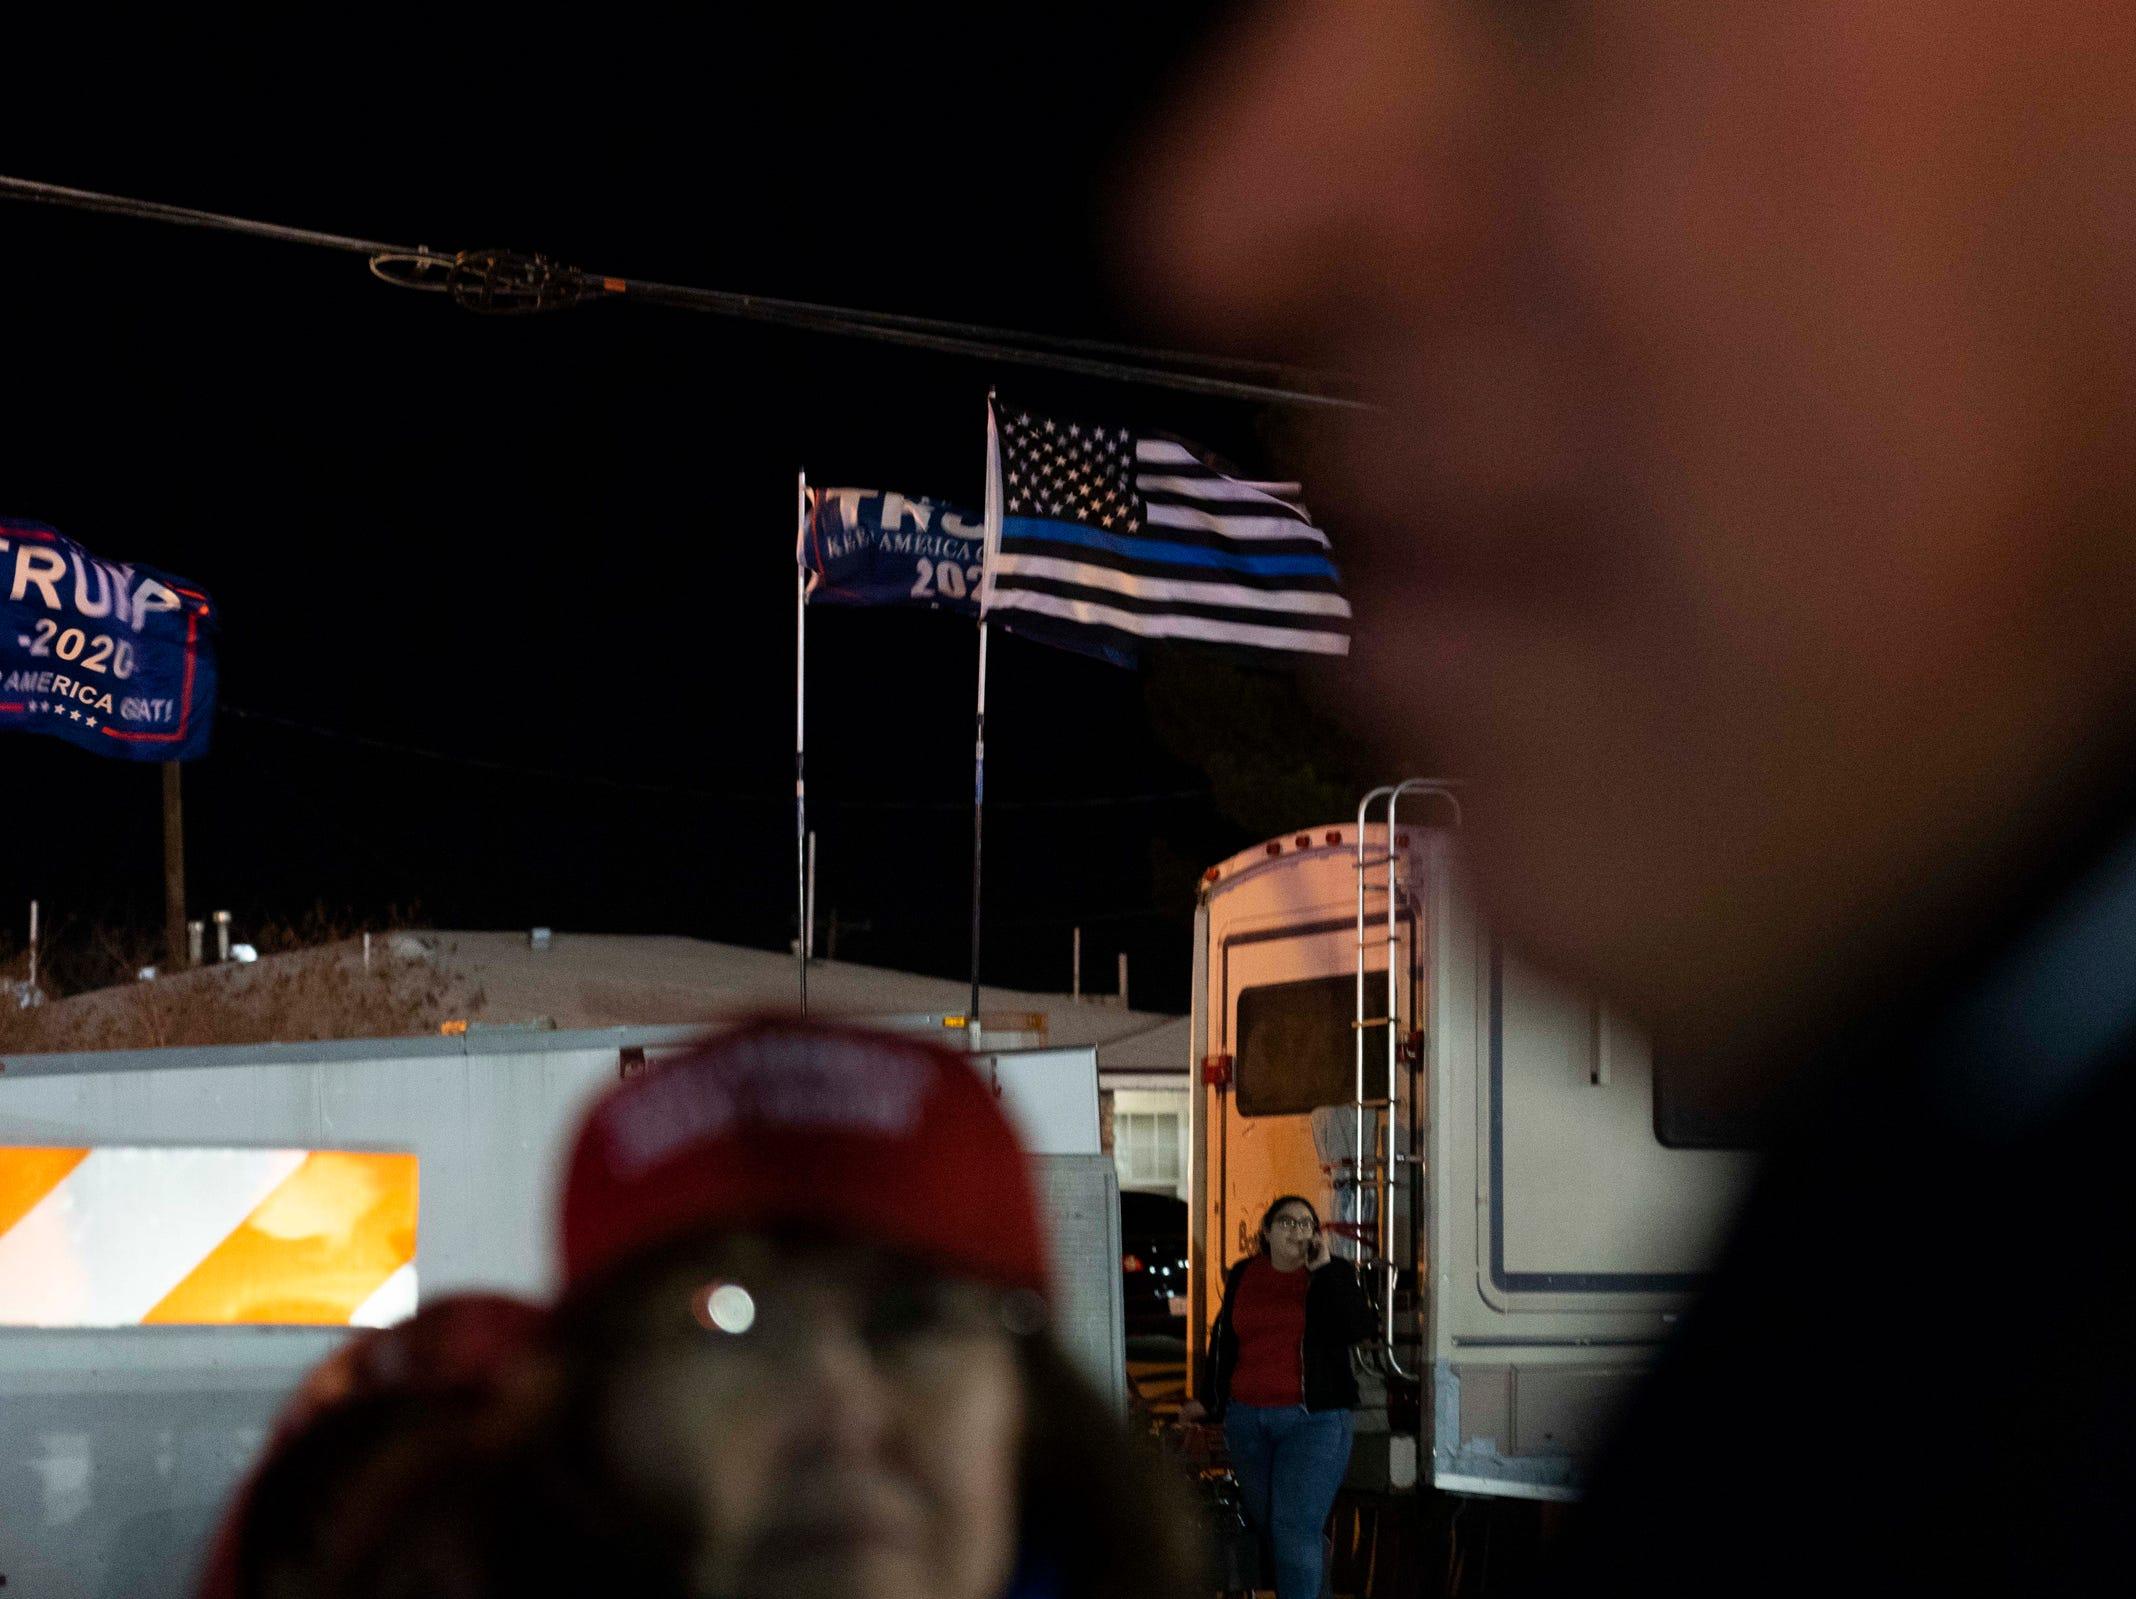 2/11/19 9:08:58 PM -- El Paso, TX, U.S.A  -- President Trump campaign rally near El Paso County Coliseum on Feb. 11, 2019.